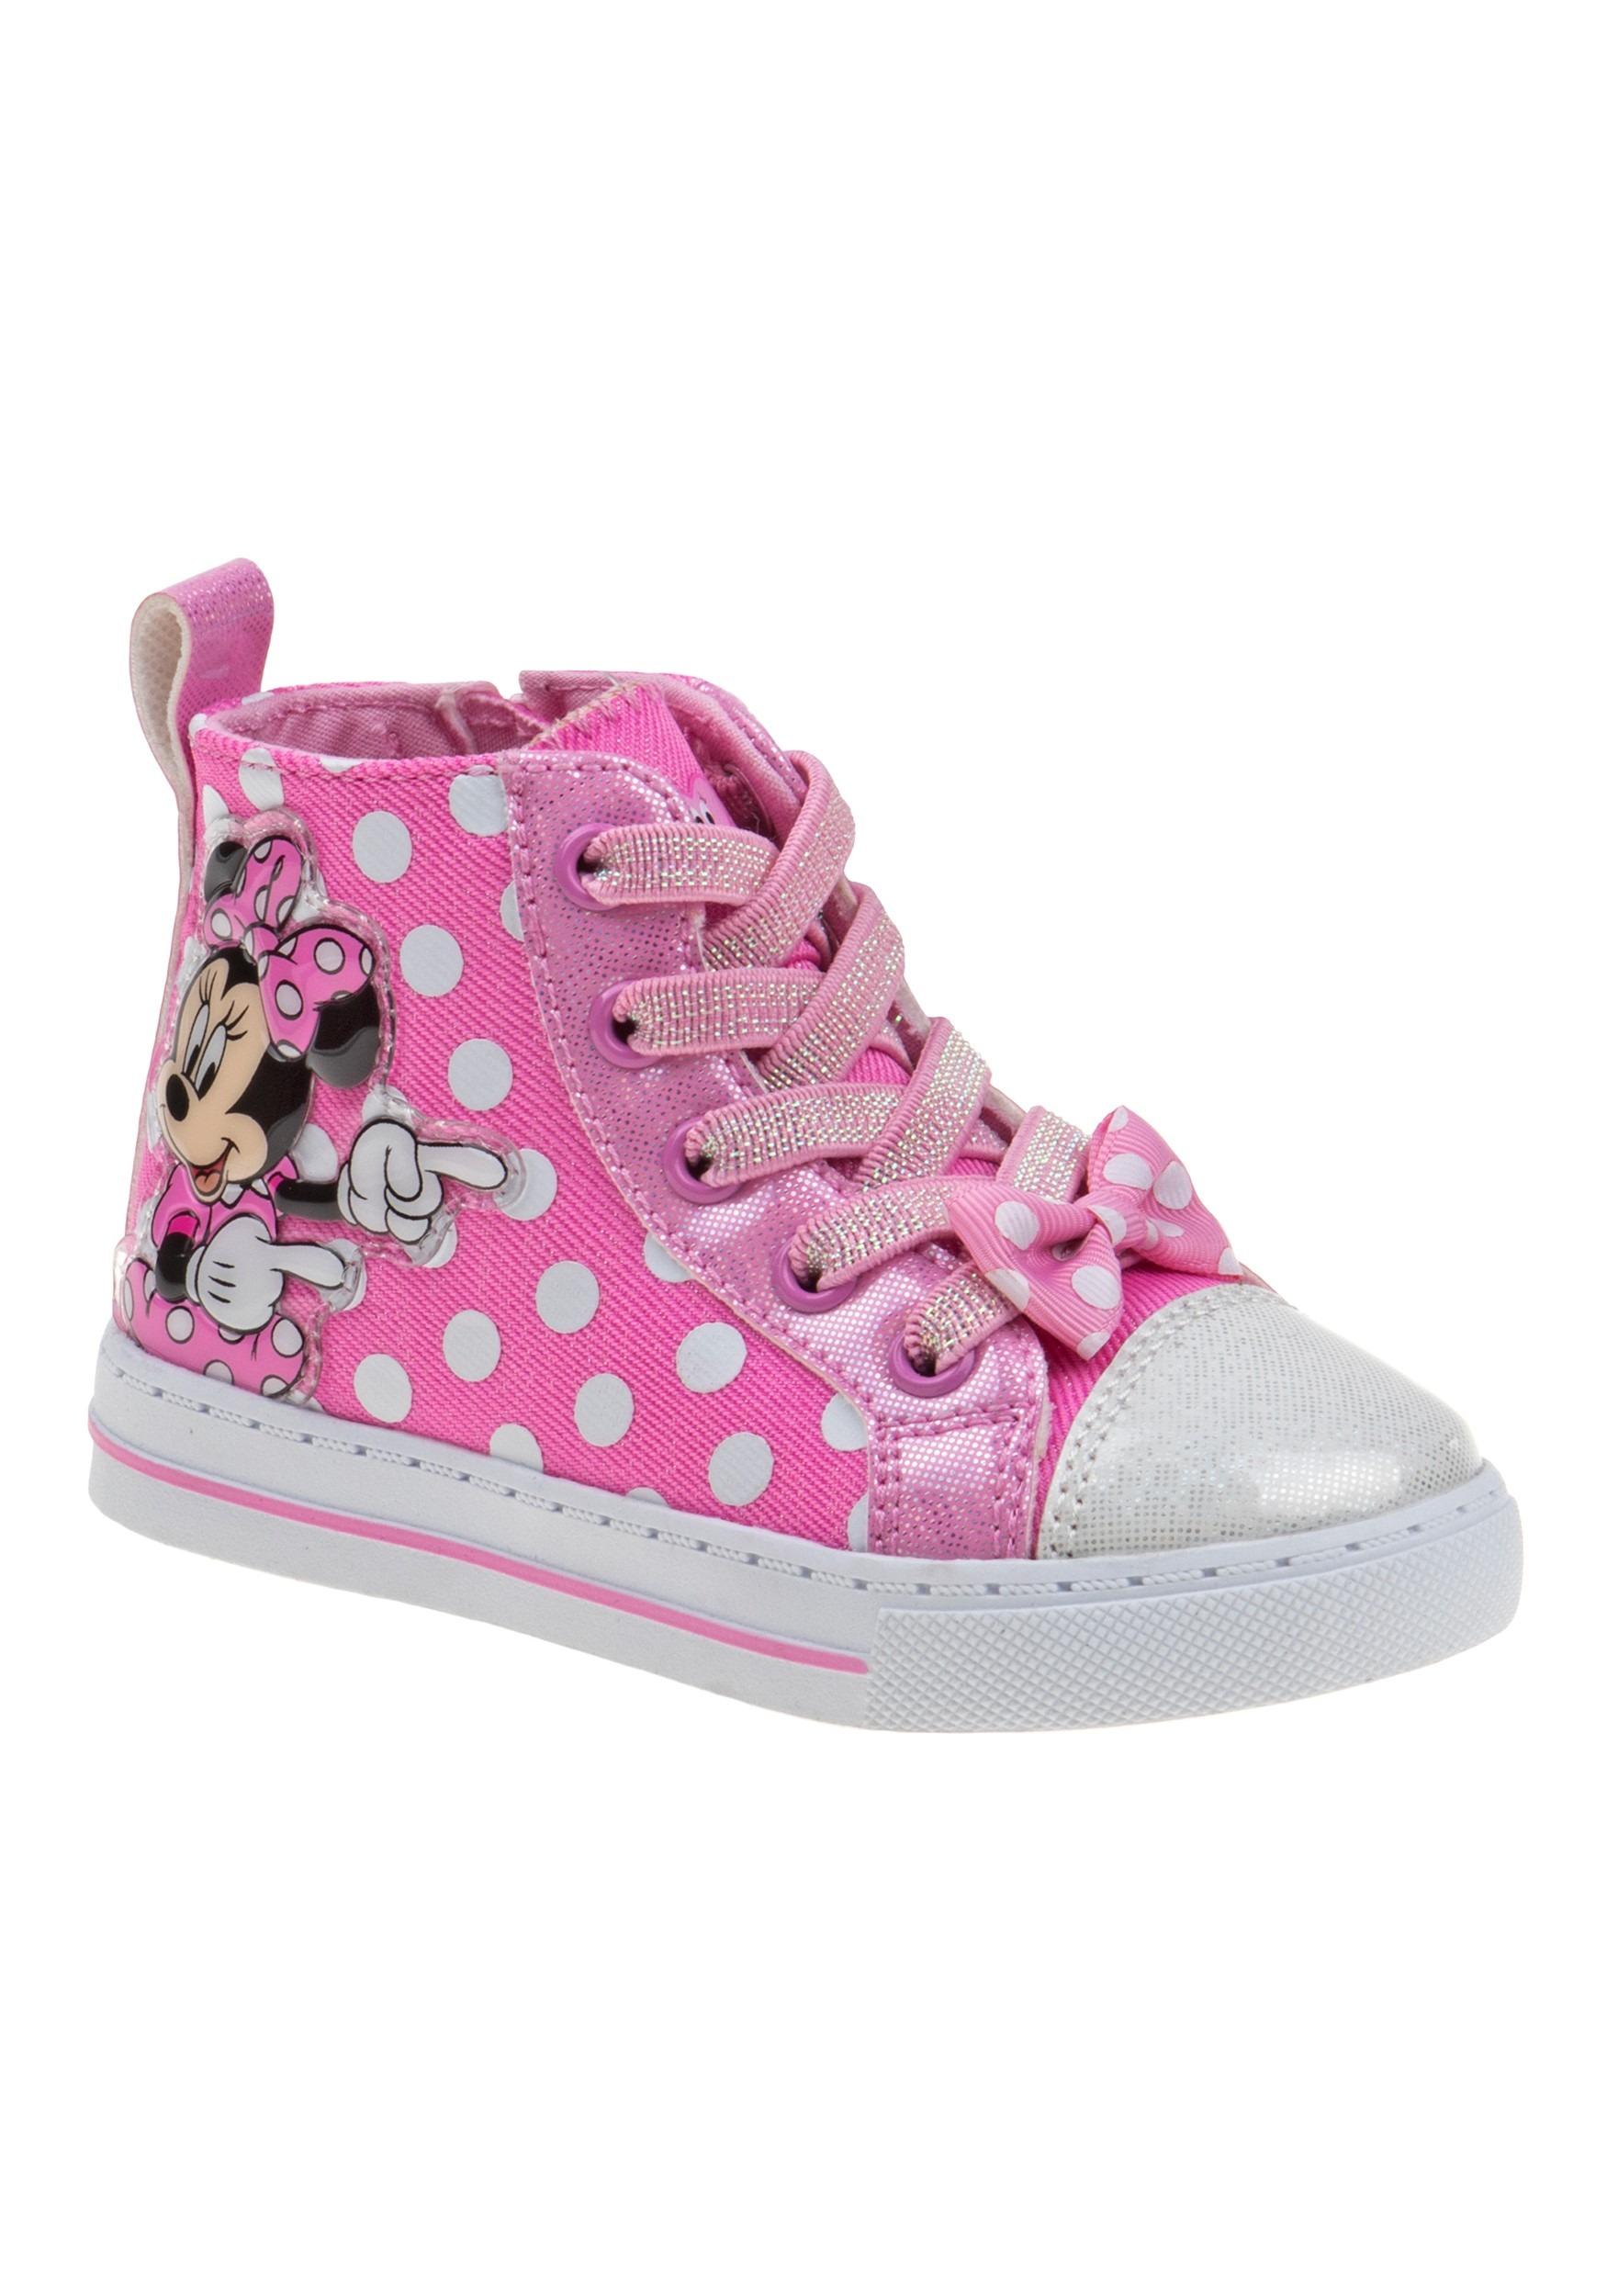 Disney Minnie Mouse Pink Polka Dot Girls Sneakers